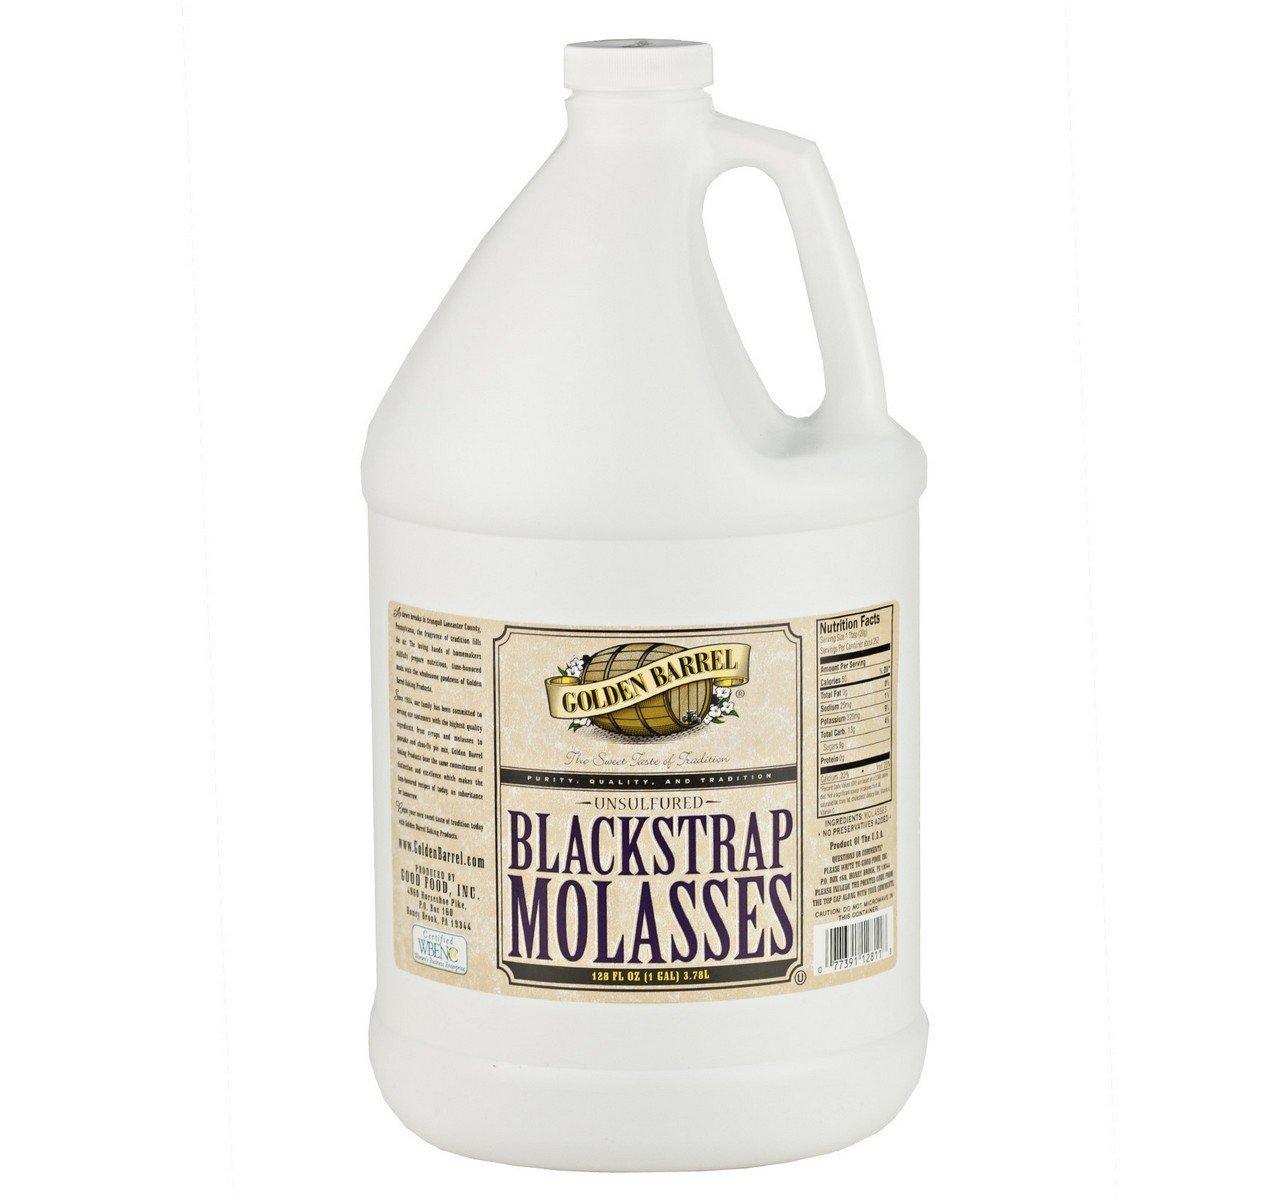 Golden Barrel Bulk Unsulfured Black Strap Molasses, 1 Gallon Jug (Pack of 2) by Golden Barrel